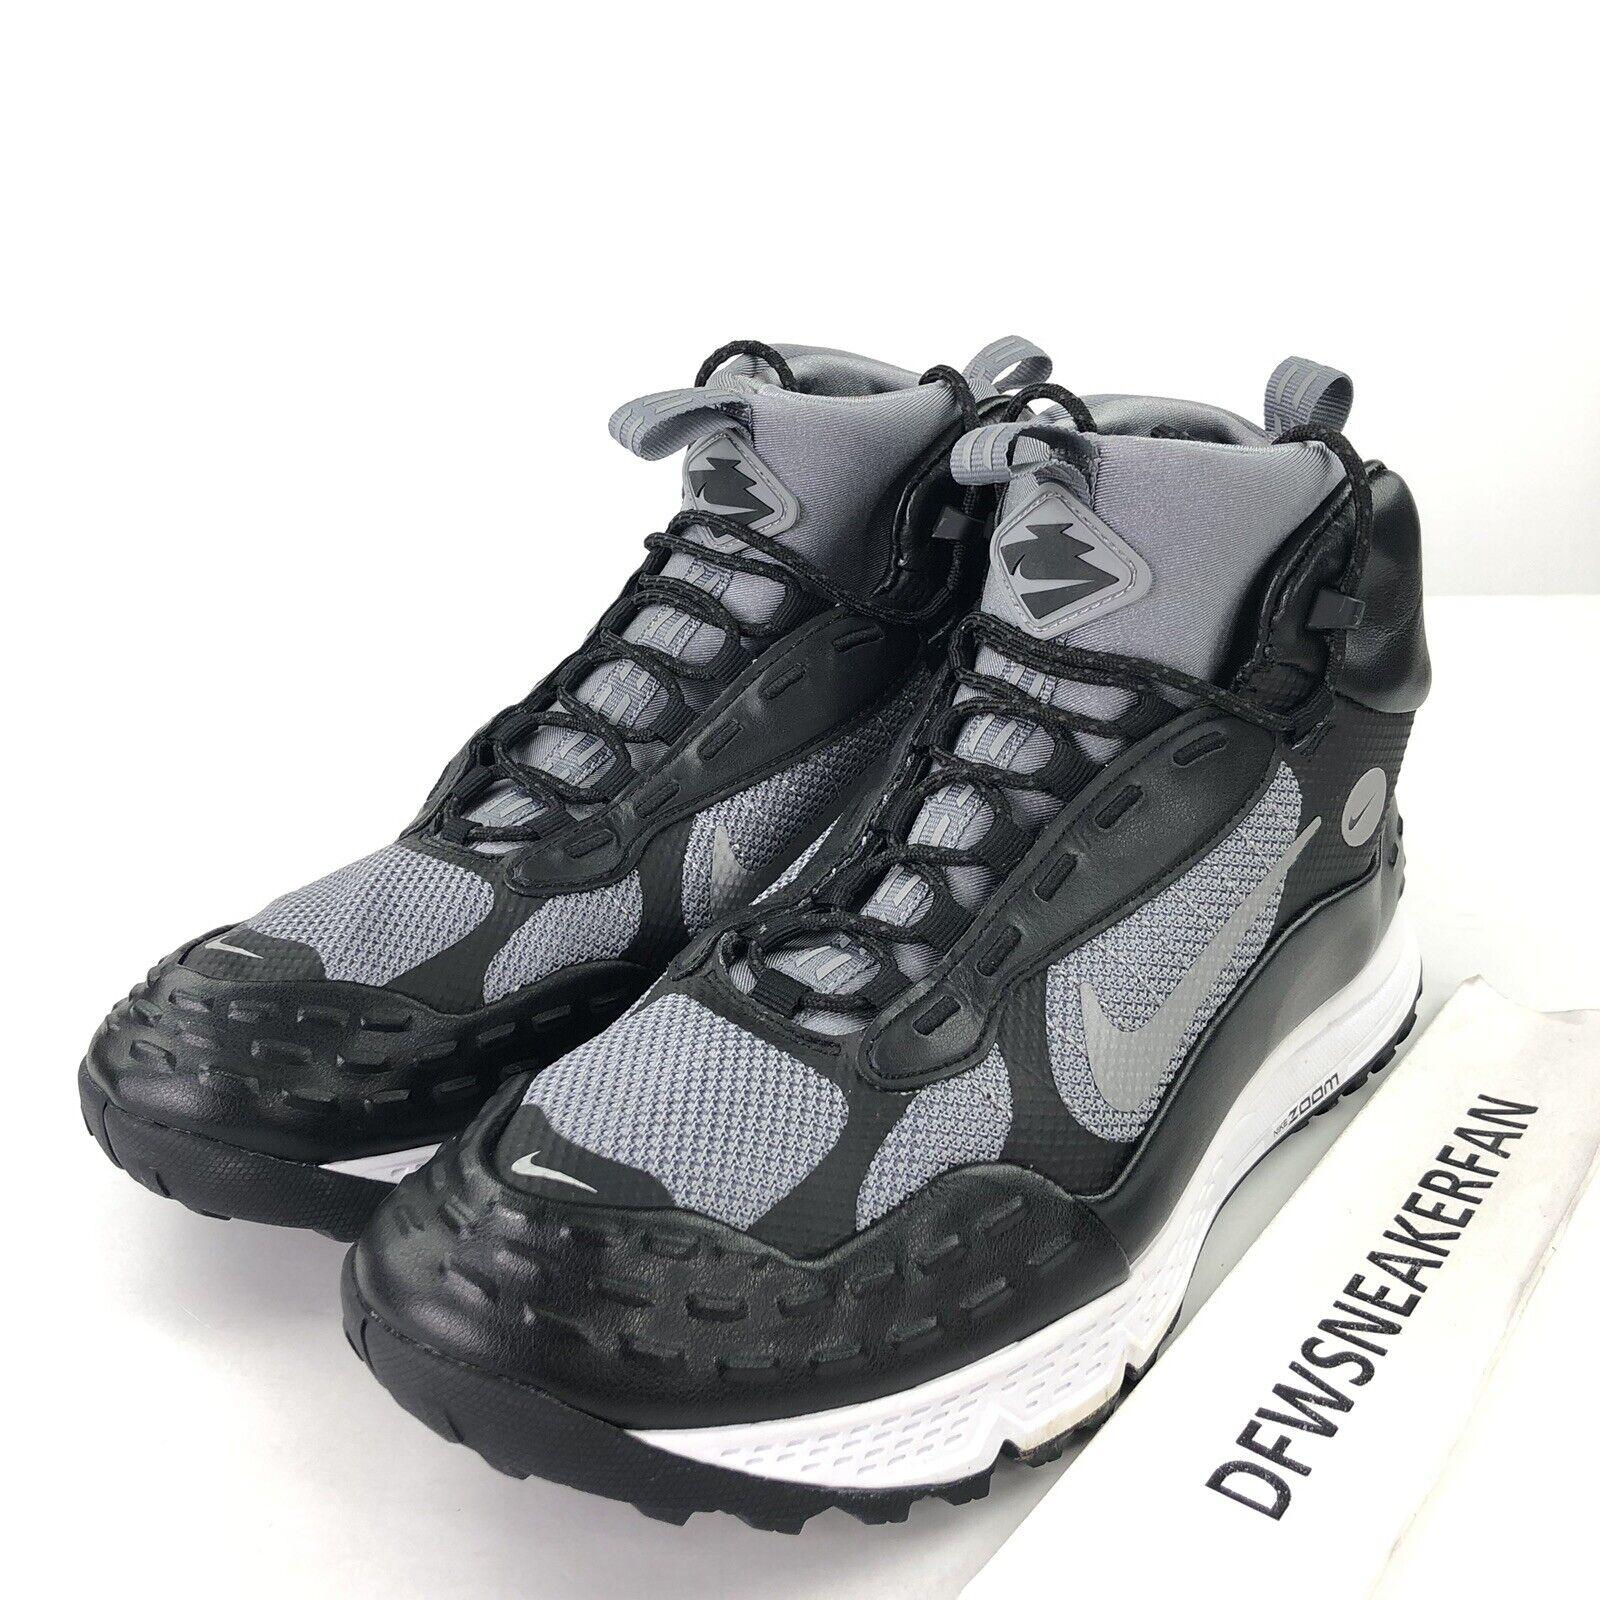 87b1f024b2e New Nike Air Zoom Sertig Men s 12 Hiking shoes Boots Black Grey 904335-001  New